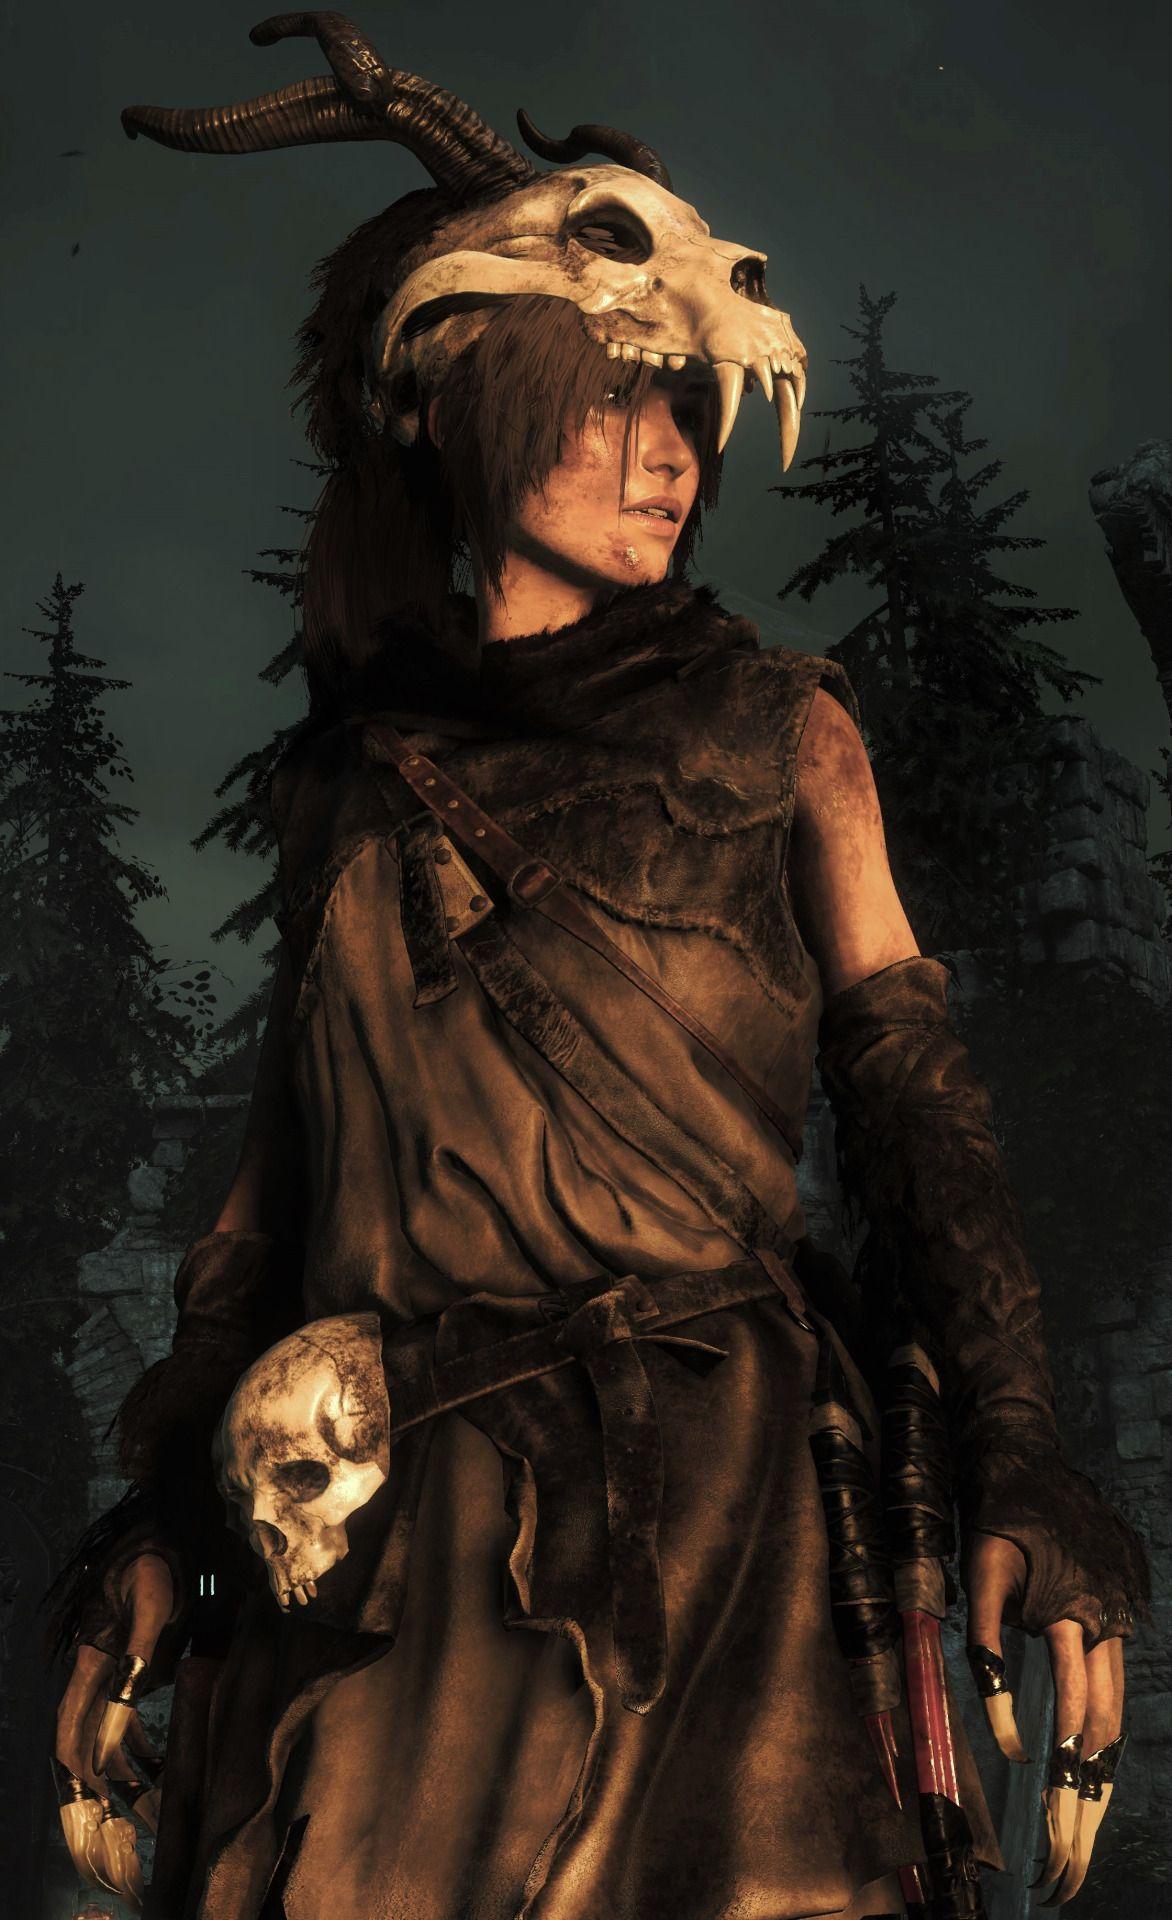 Lara croft in baba yaga tomb raider cosplay computerspiele e